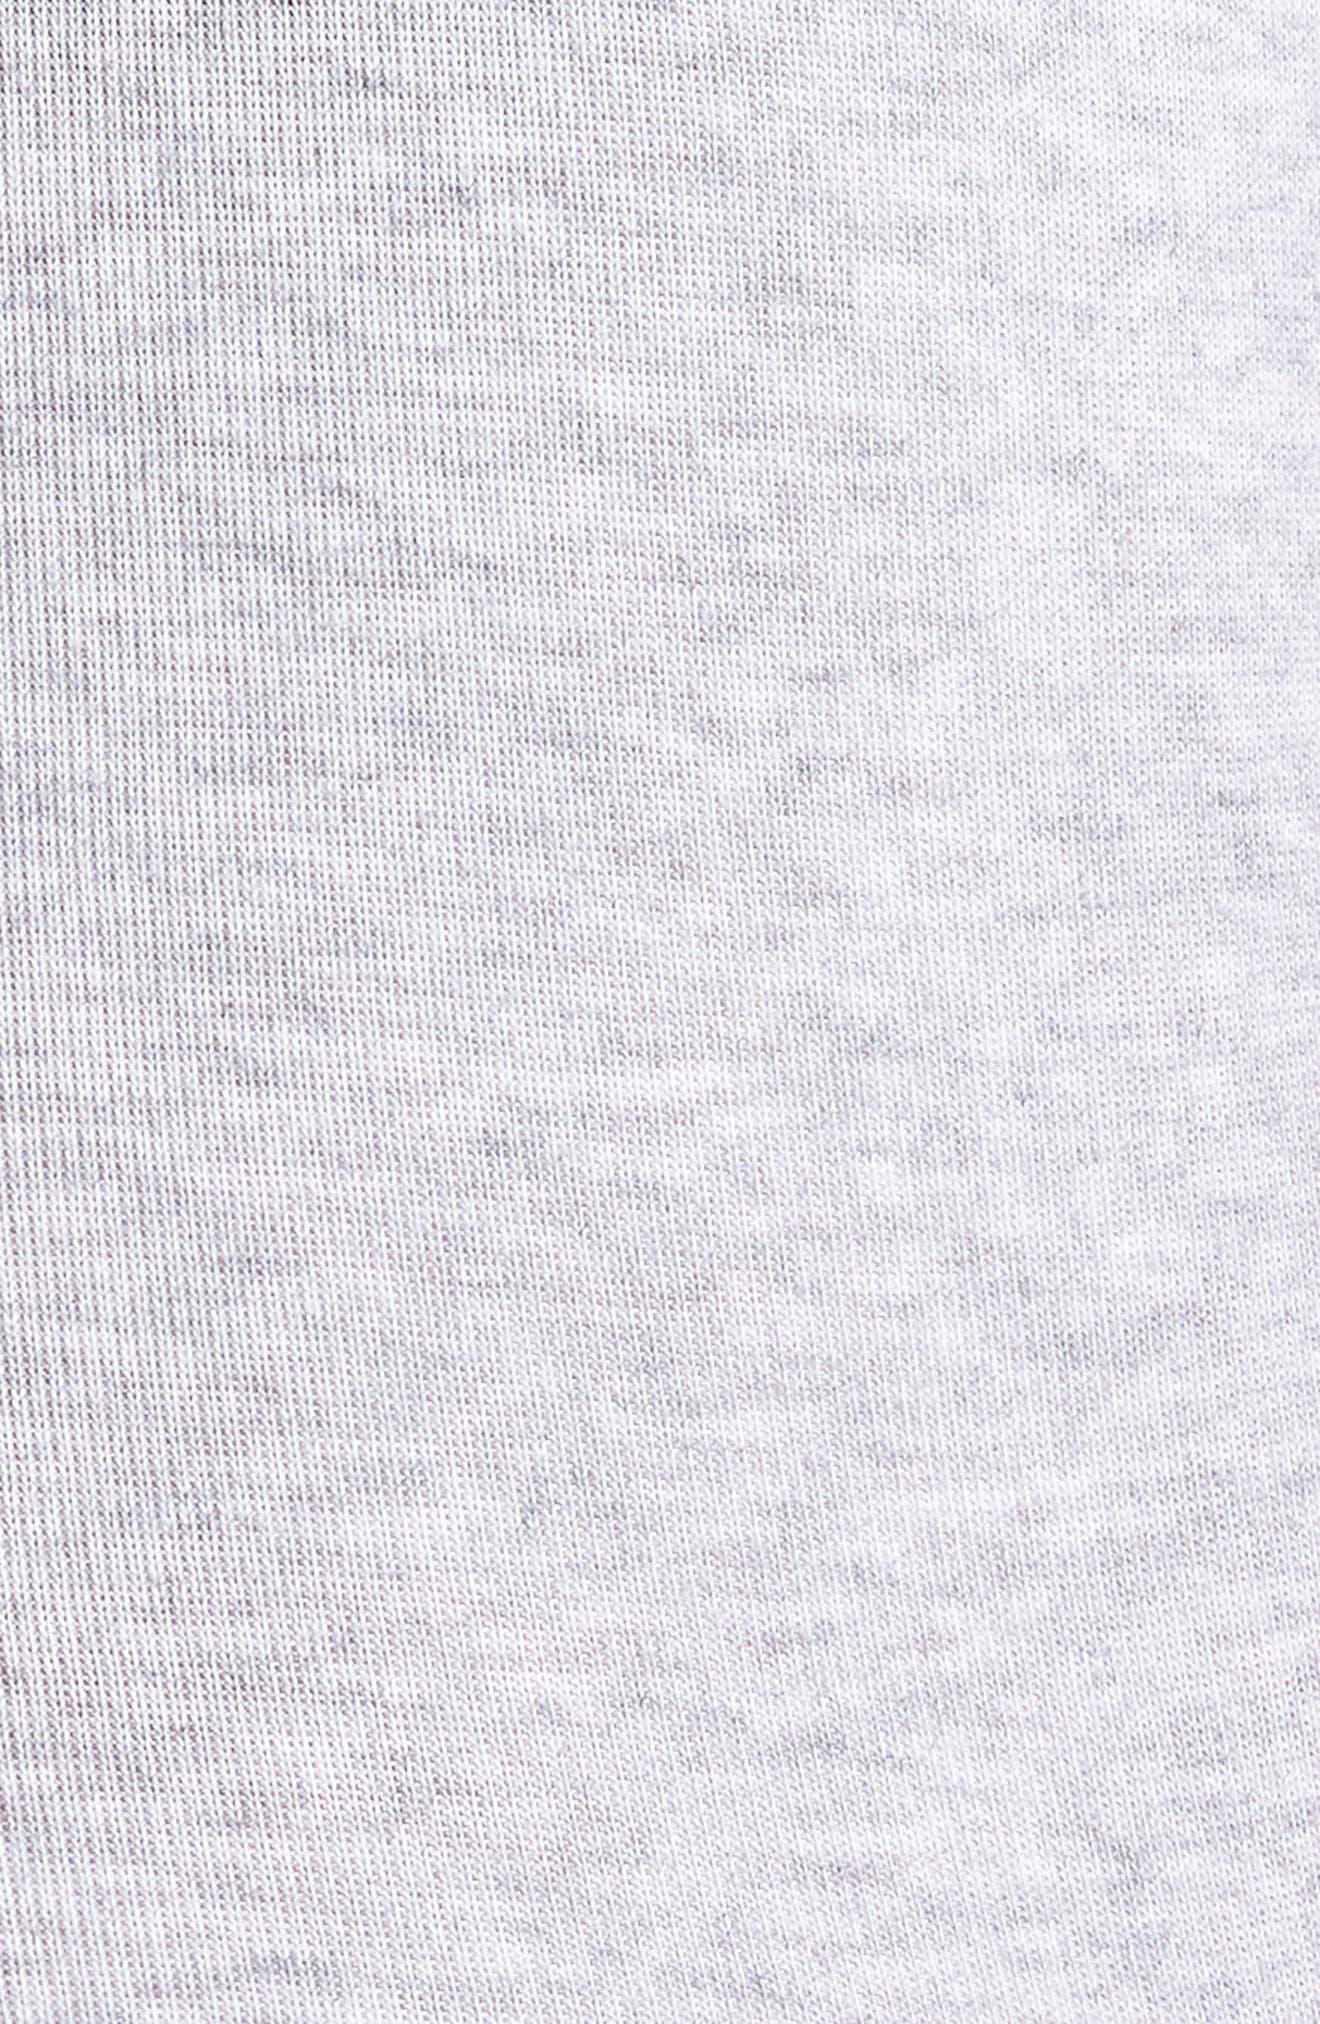 NORDSTROM MEN'S SHOP, 4-Pack Supima<sup>®</sup> Cotton Briefs, Alternate thumbnail 6, color, BLACK/ NAVY/ GREY